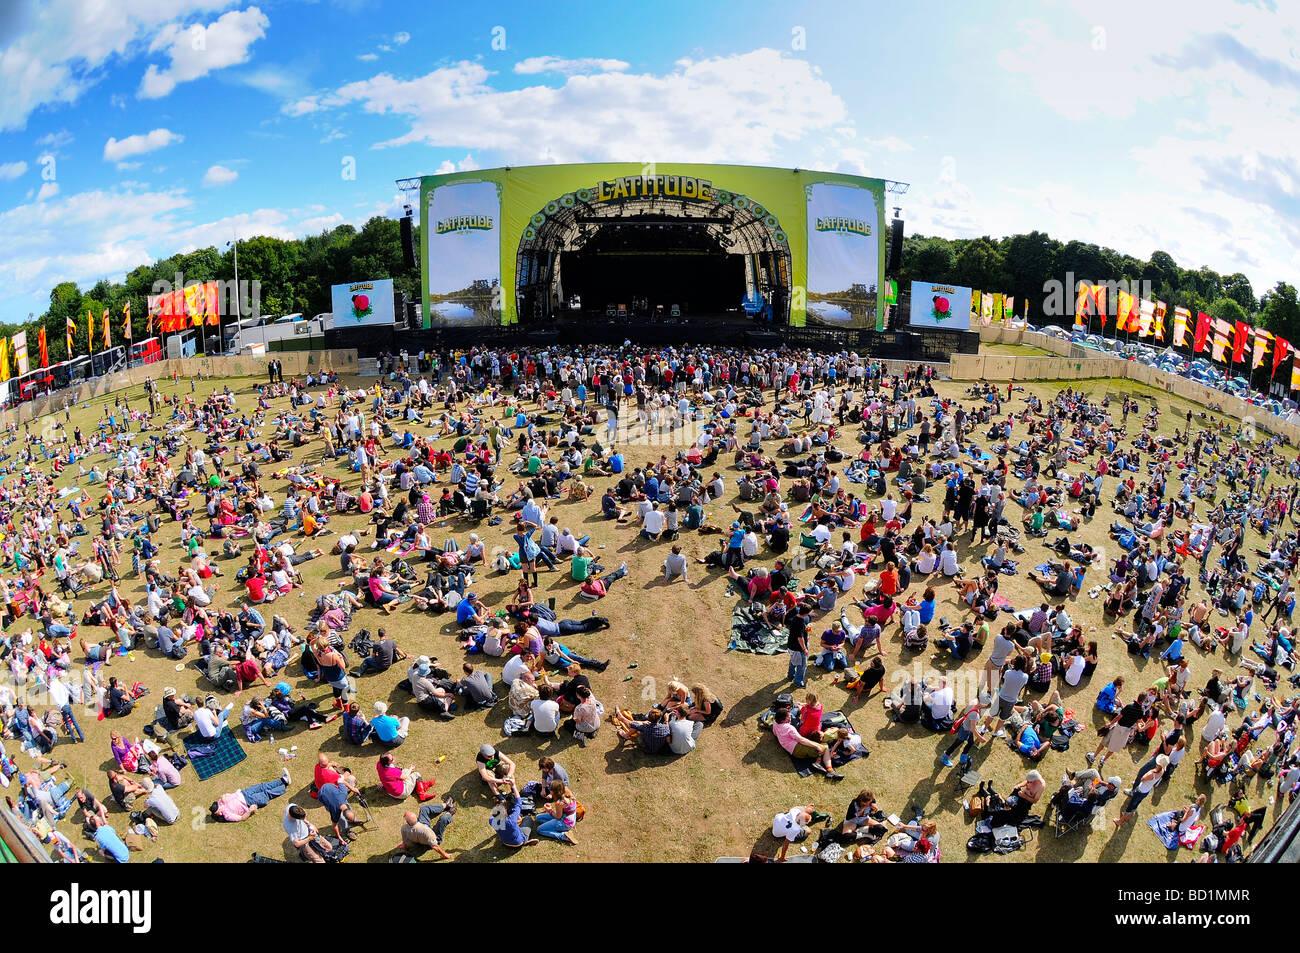 Latitude Music Festival Main Stage, Southwold, Suffolk, UK - Stock Image